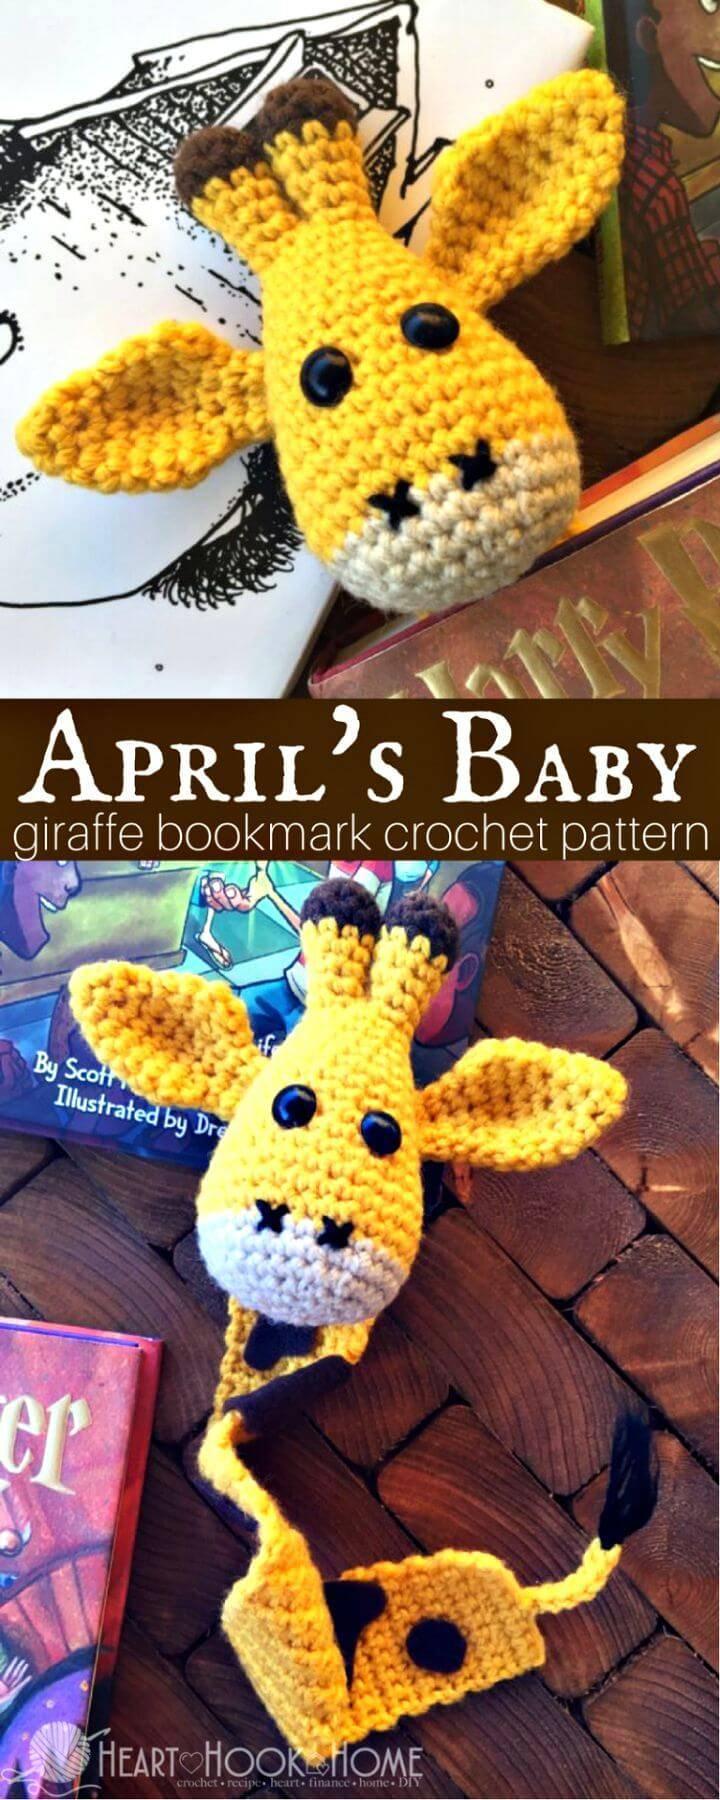 How To Crochet April's Baby Giraffe Bookmark Amigurumi Pattern